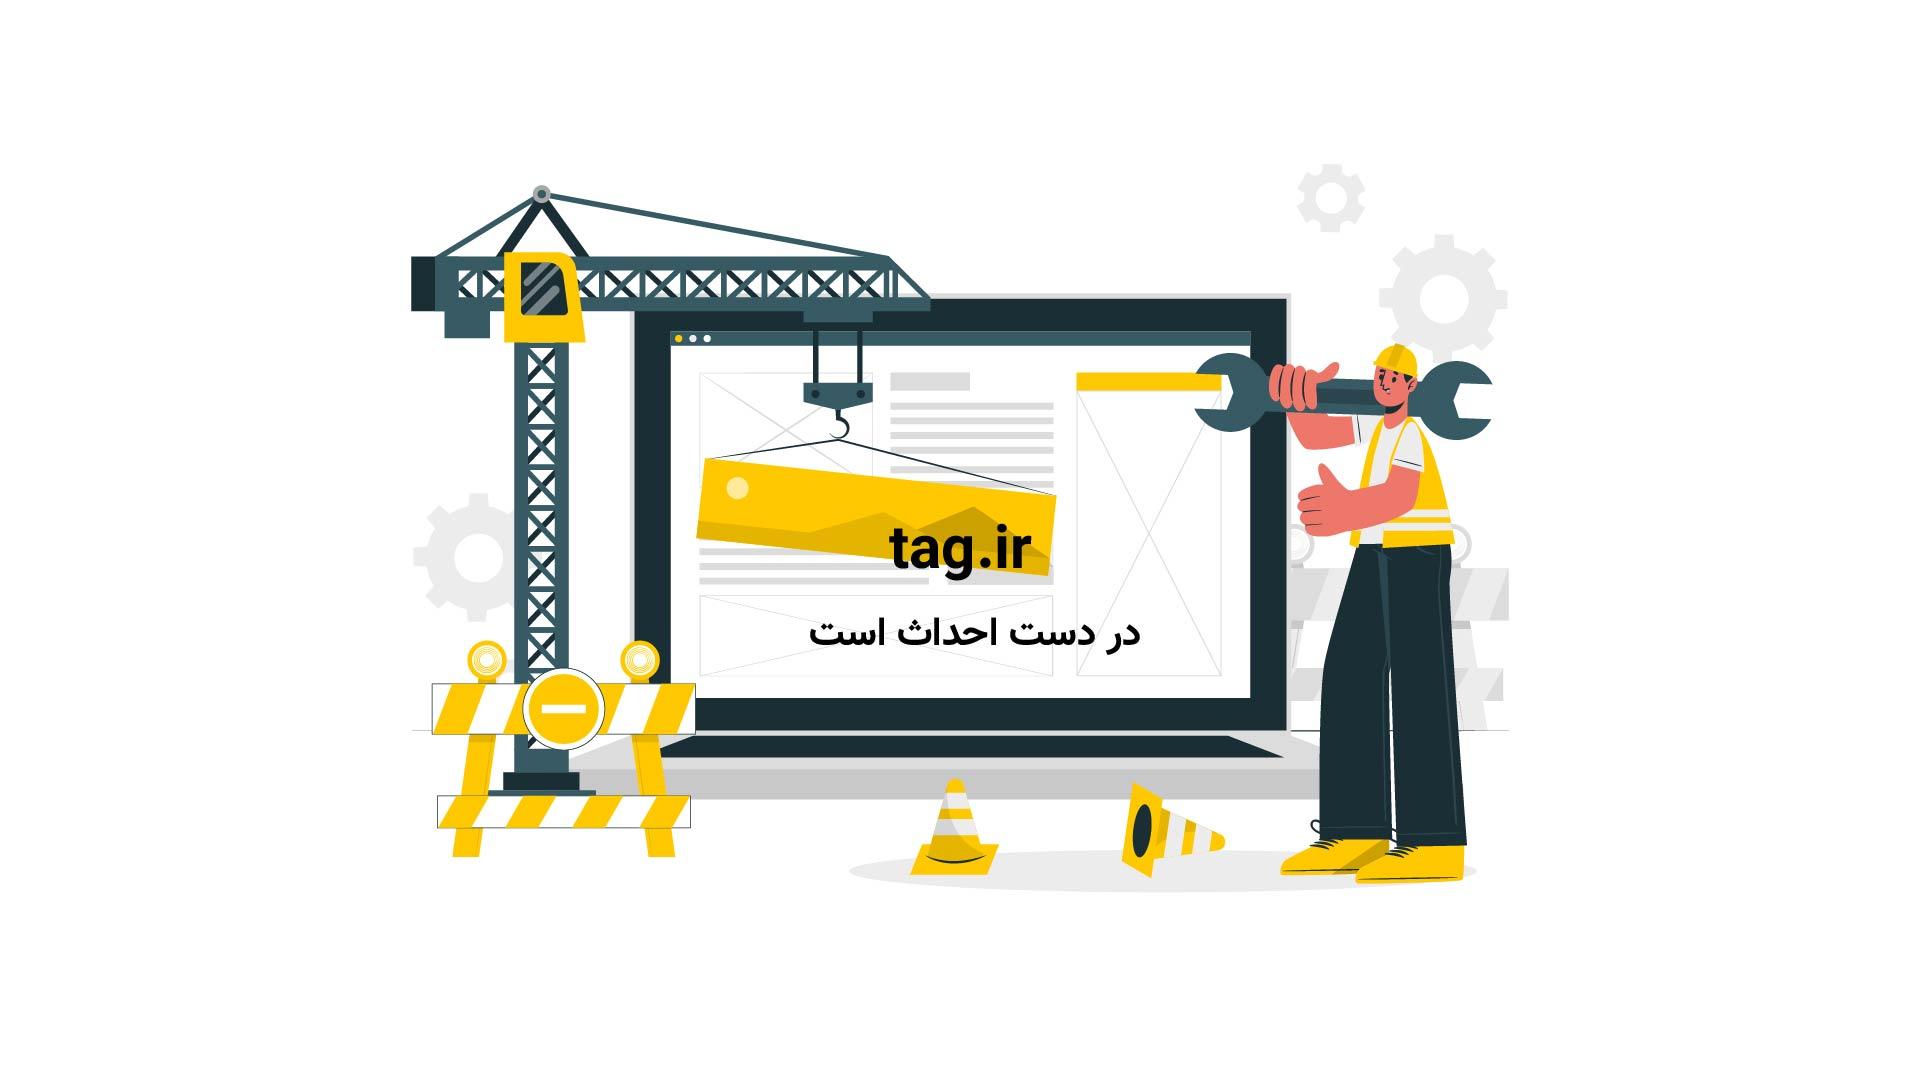 زلزله-مکزیک | تگ